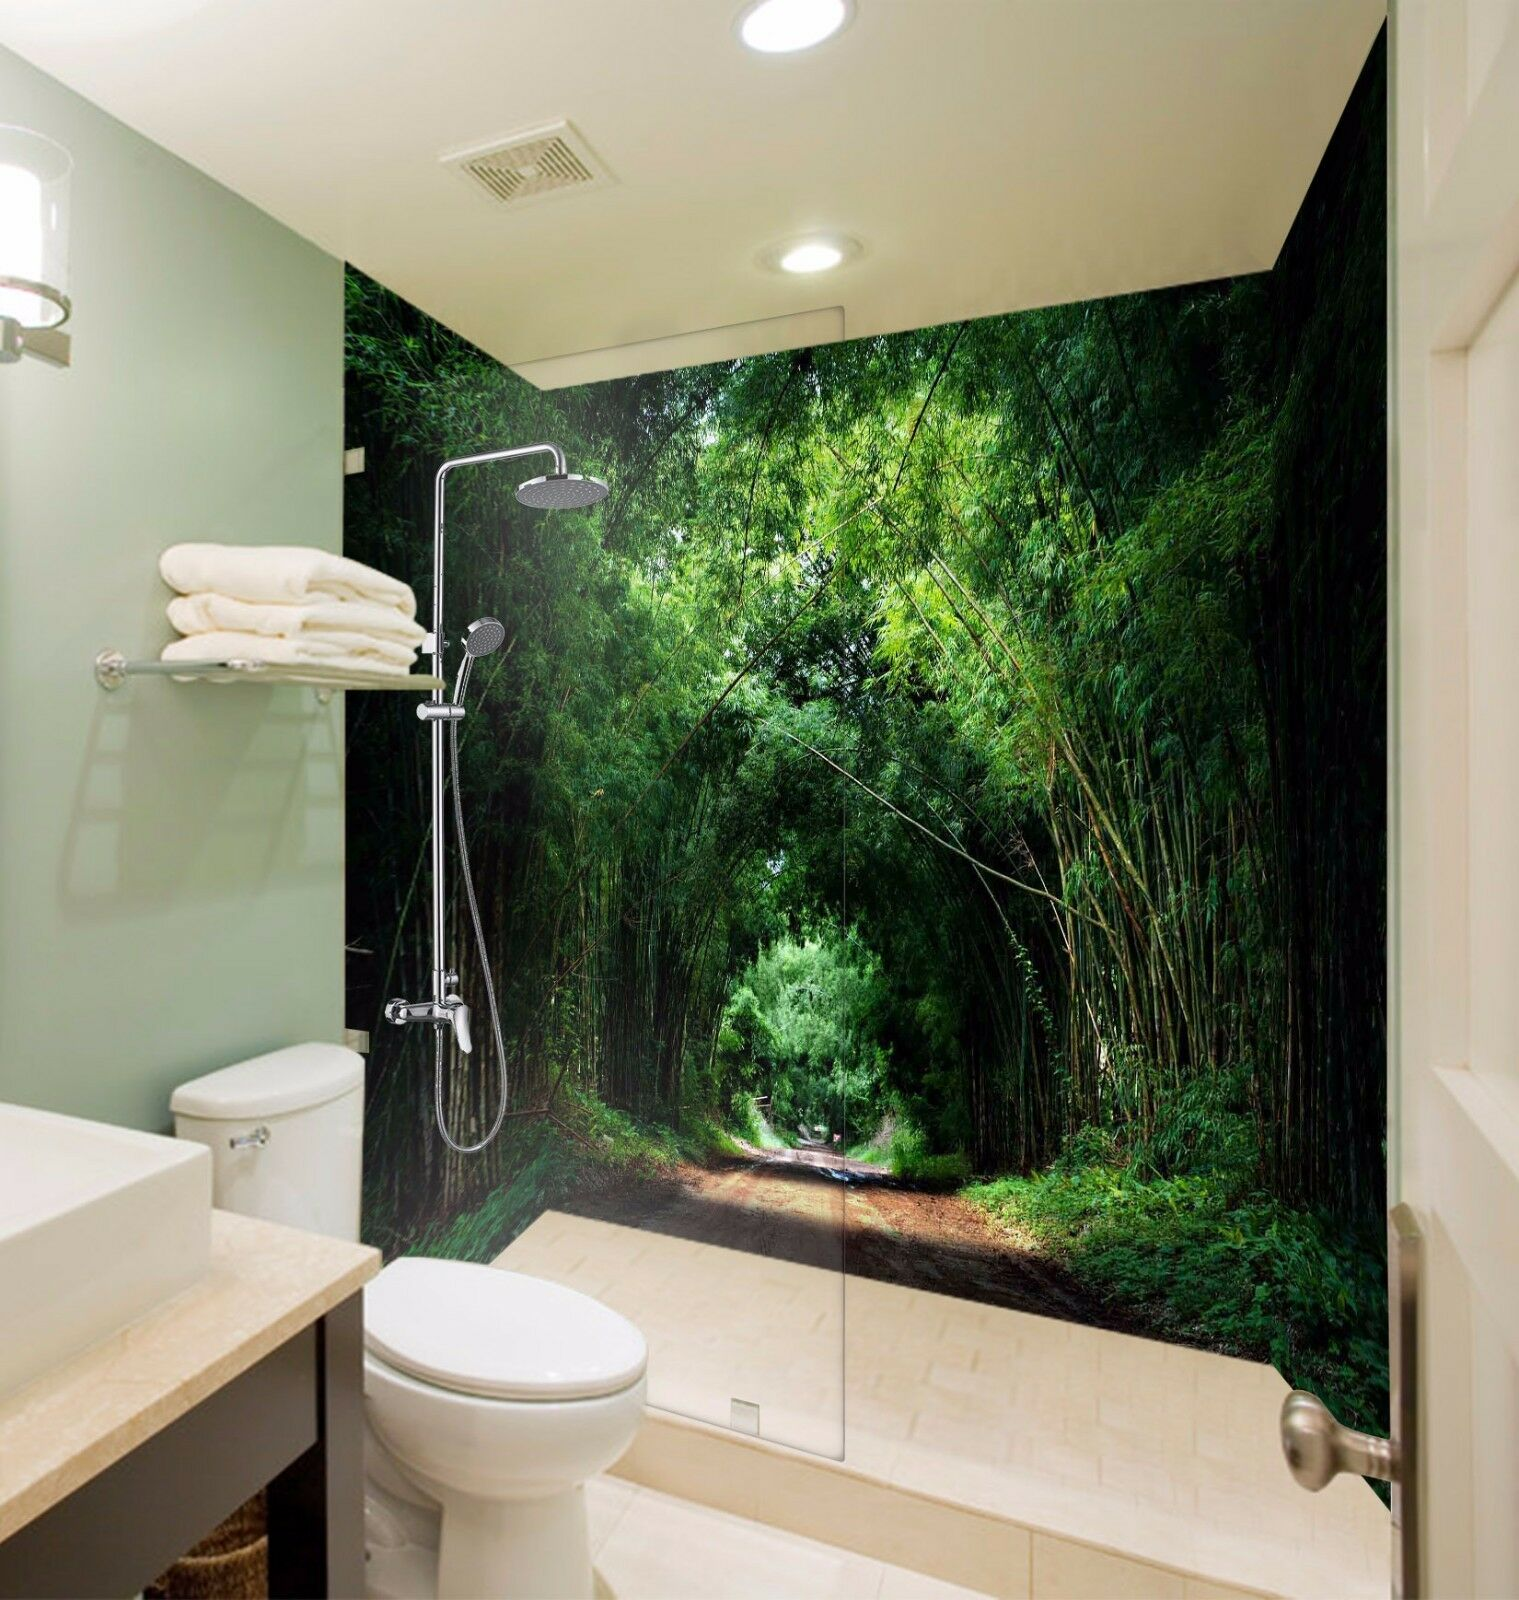 3D  Peaceful  7101  WallPaper Bathroom Print Decal Wall Deco AJ WALLPAPER AU